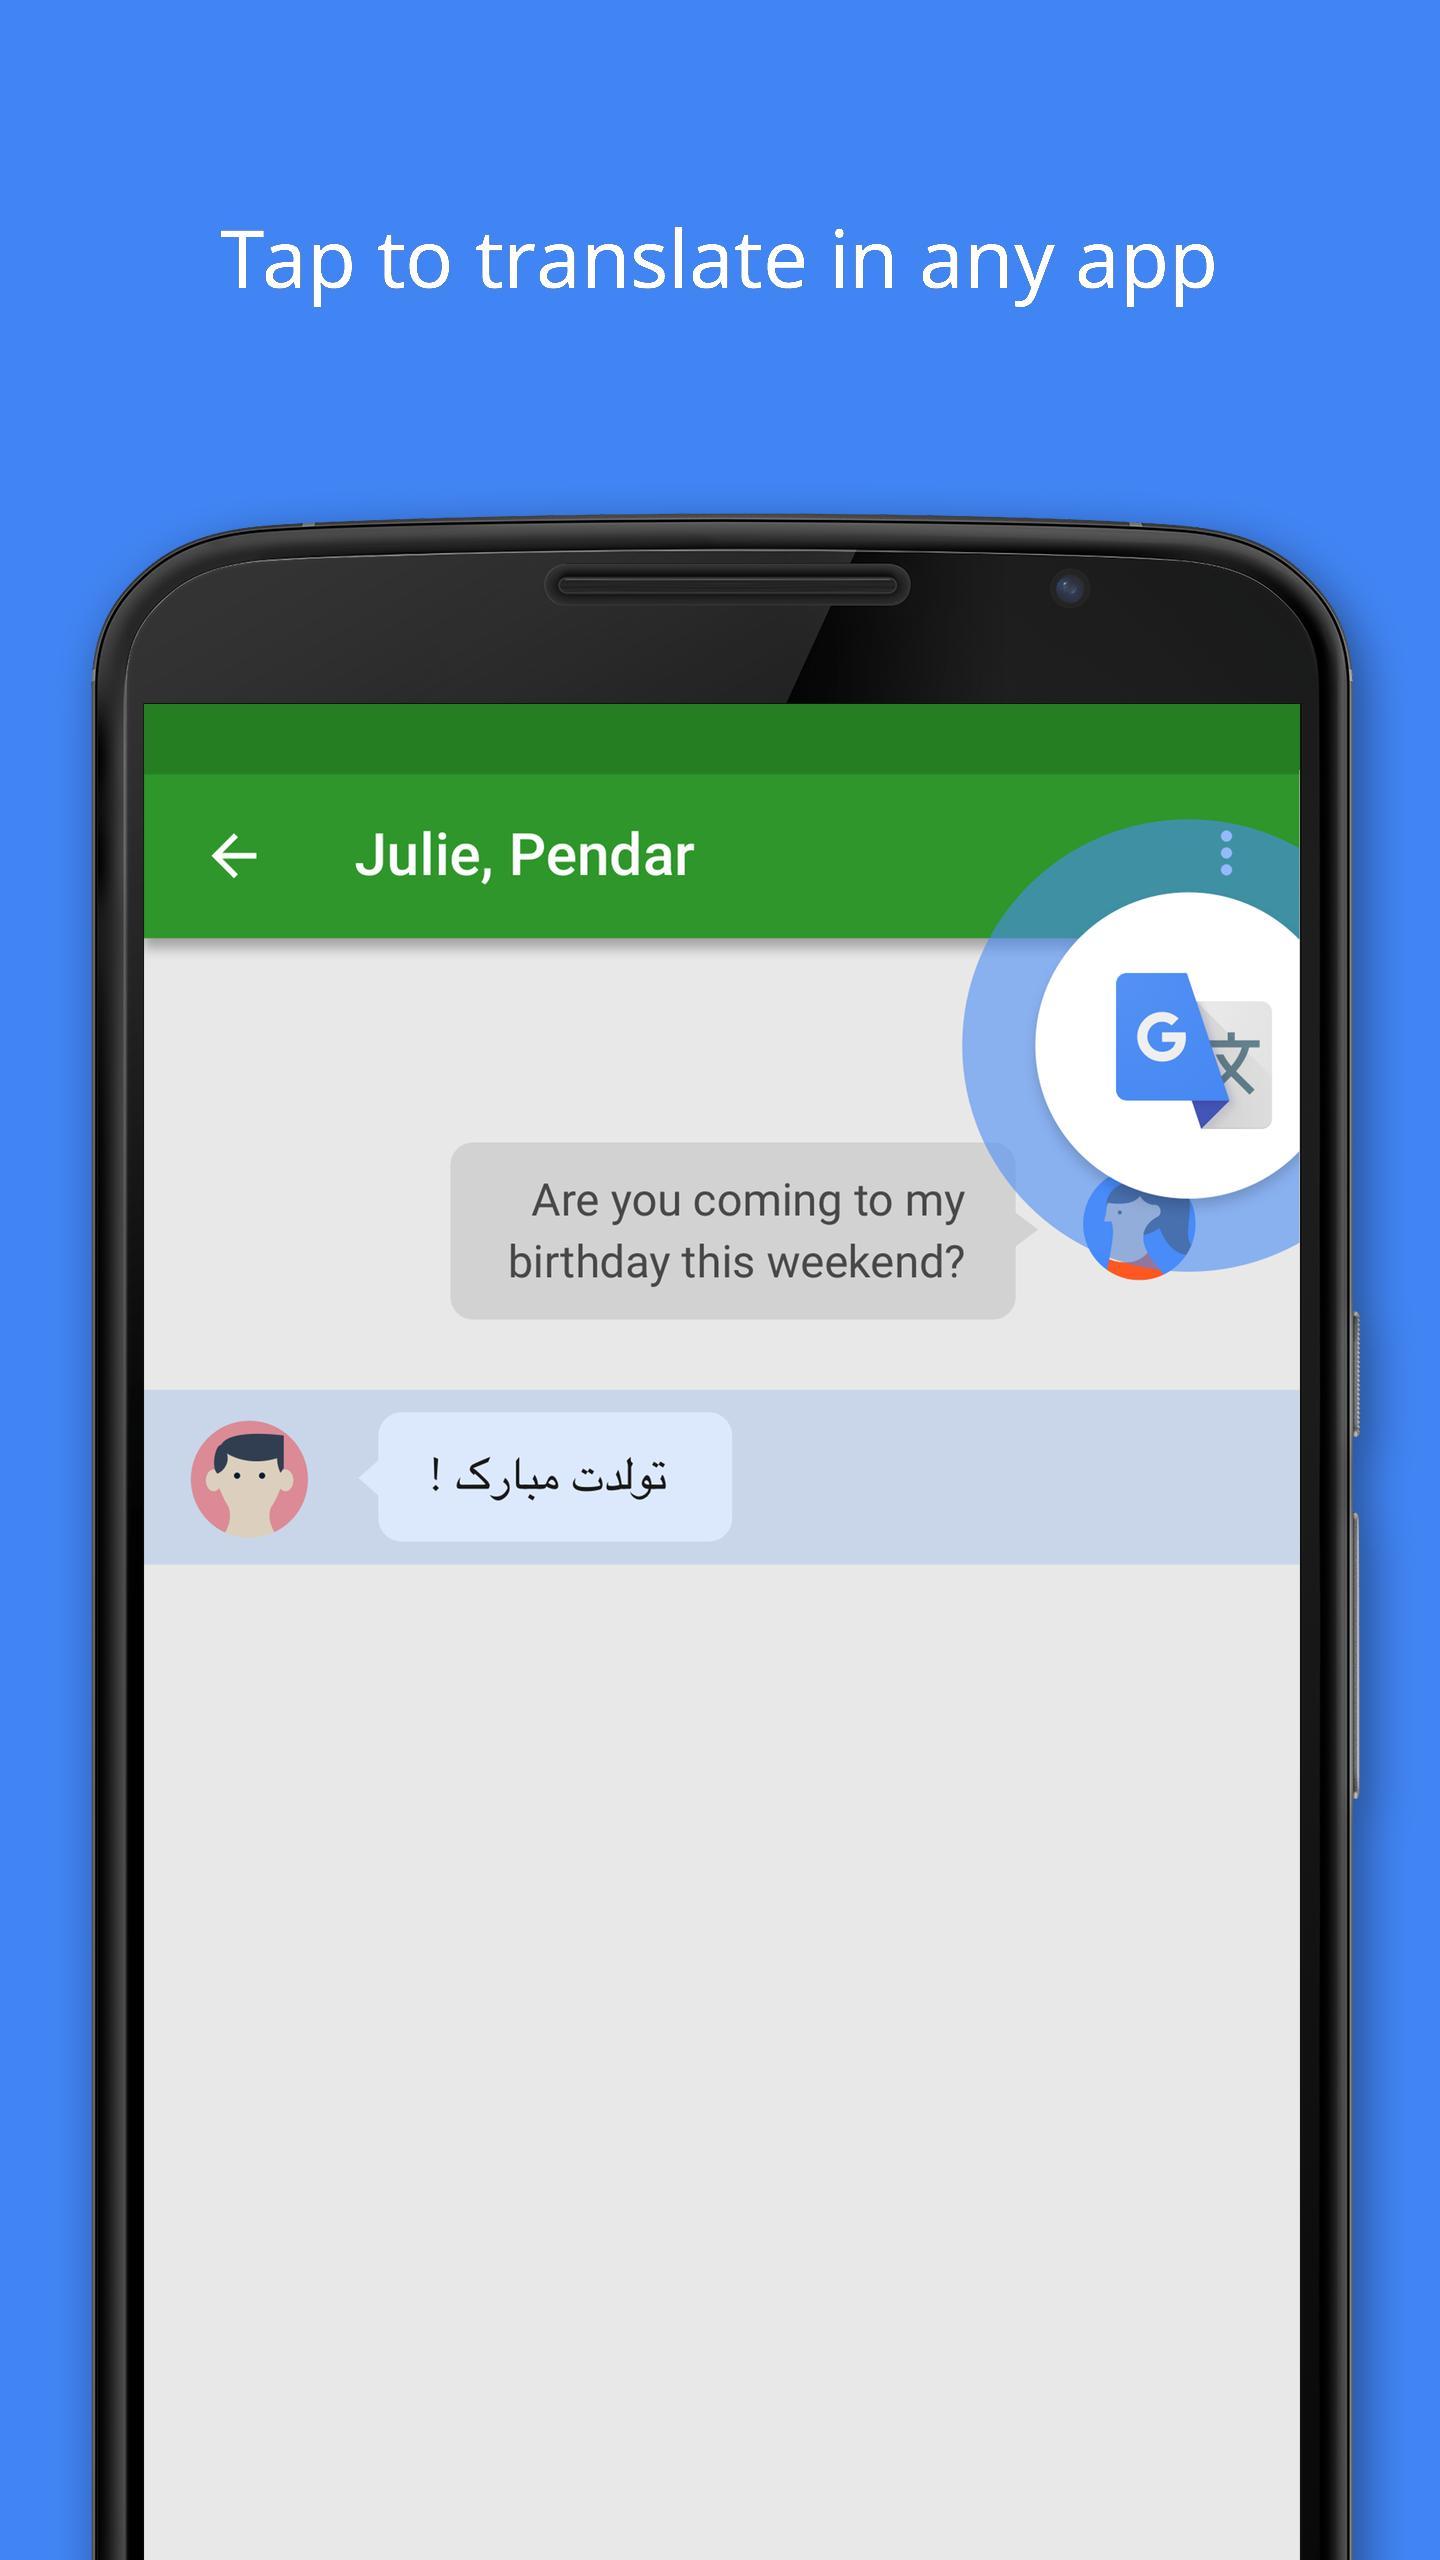 Google Translate 6.14.0.03.342186690 Screenshot 1